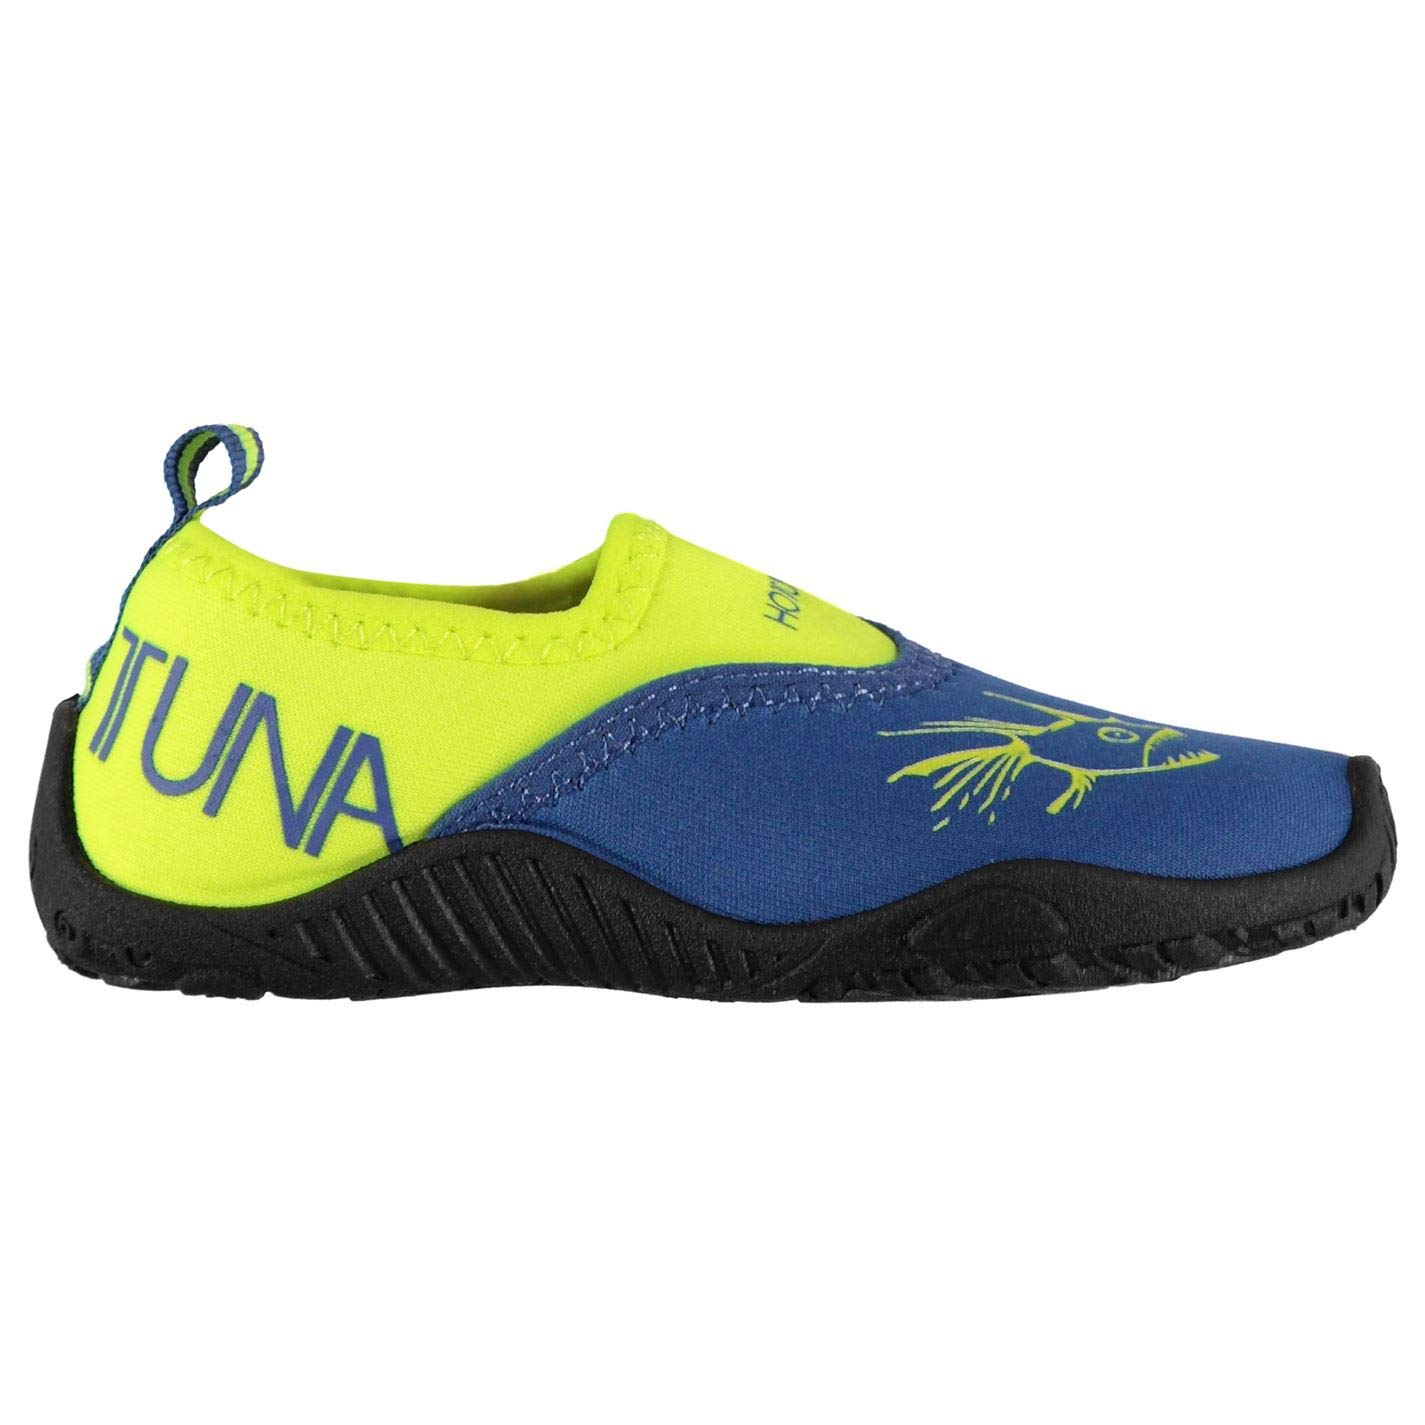 Kids Hot Tuna Childrens Aqua Water Shoes Splasher Pattern New